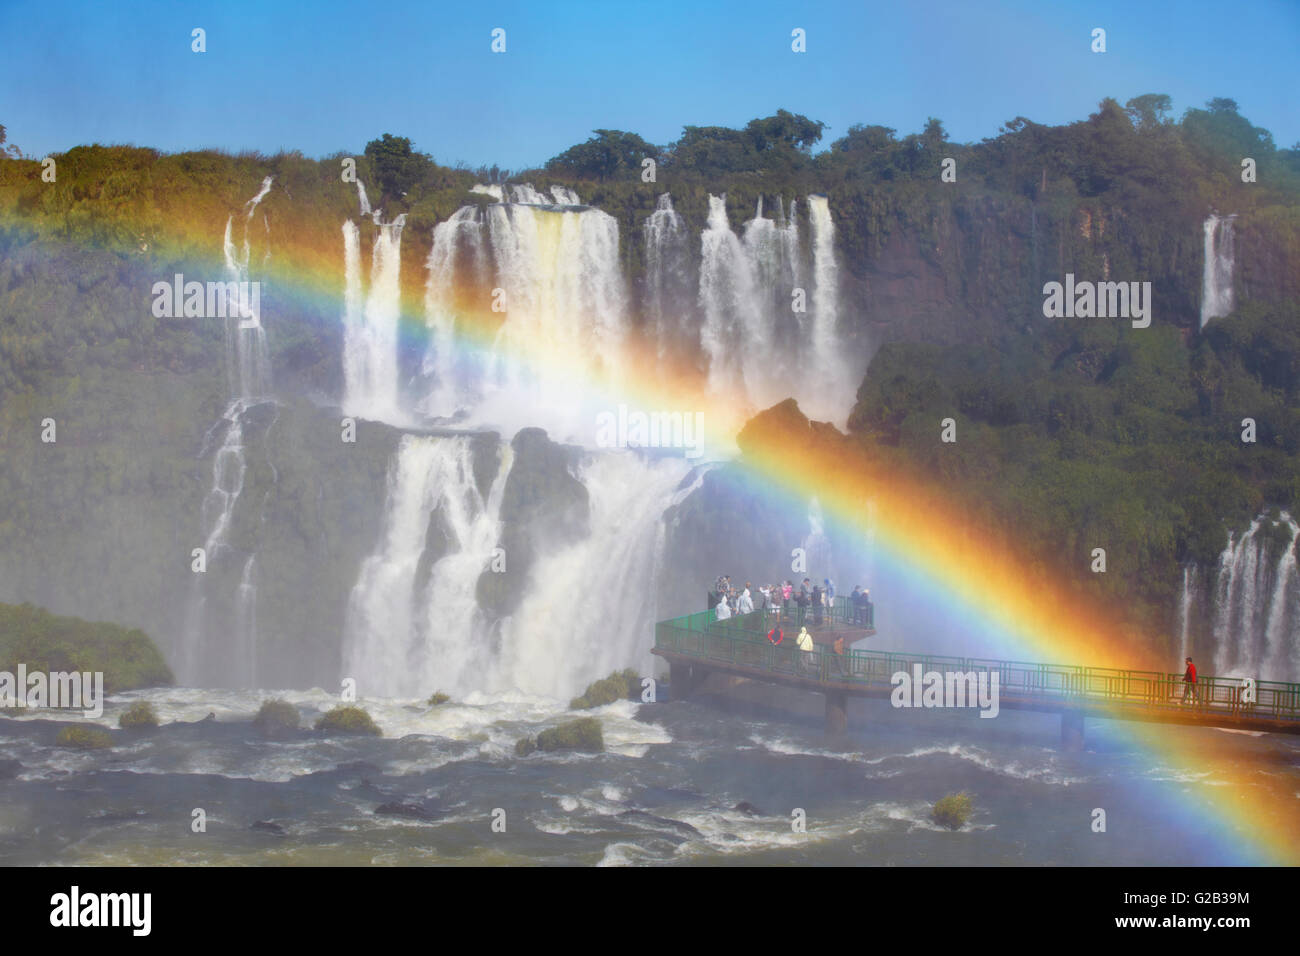 Tourists on walkway at Iguacu Falls, Iguacu National Park, Iguacu, Parana, Brazil - Stock Image